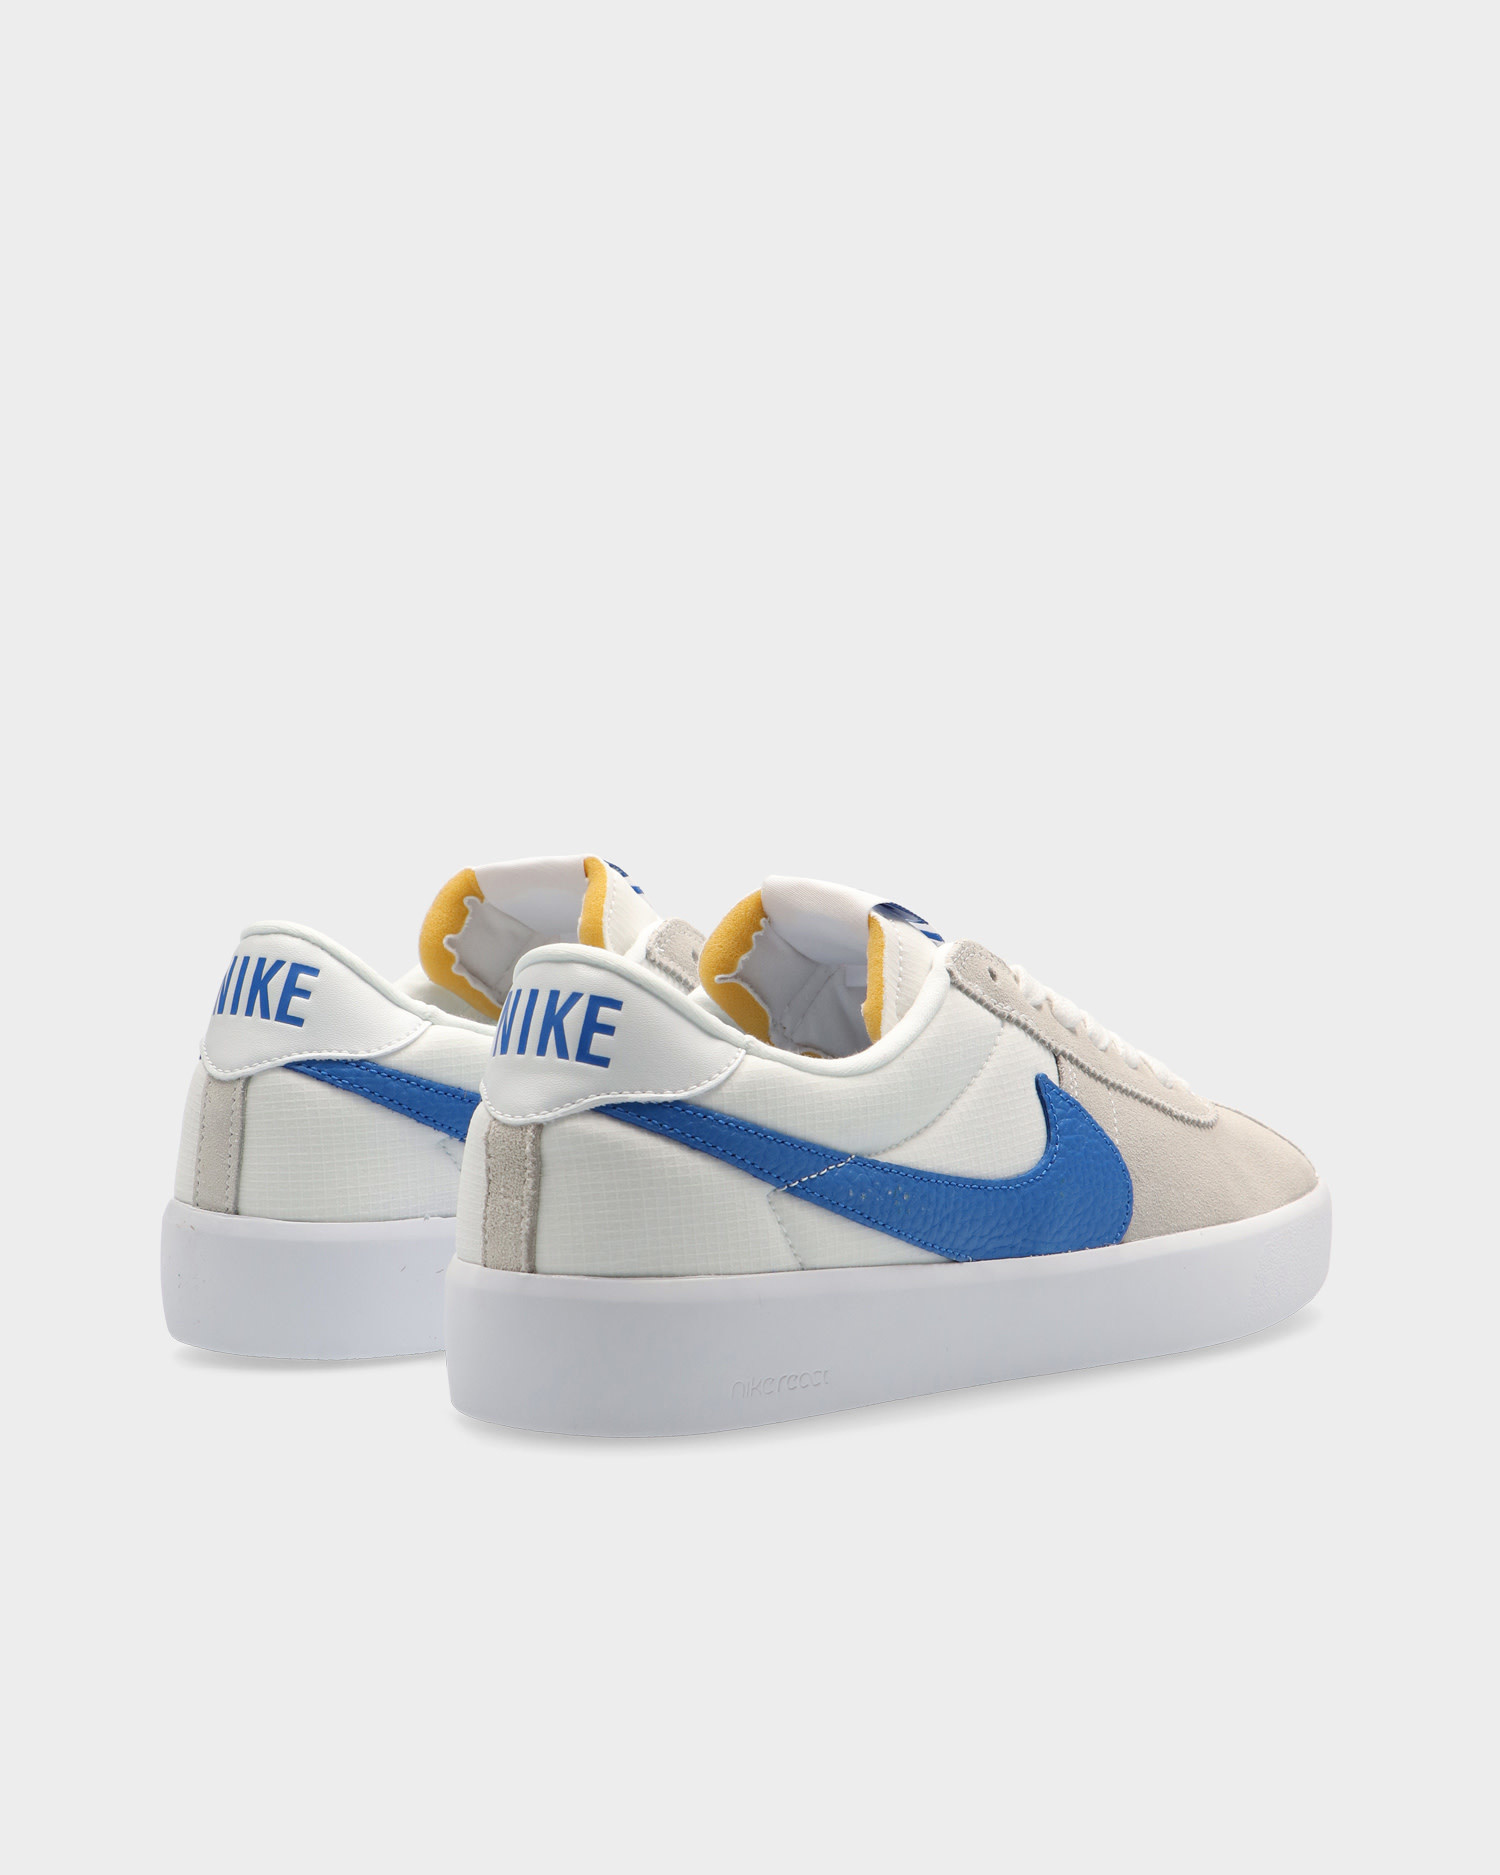 Nike SB Zoom Bruin React SmtWht/SigBl